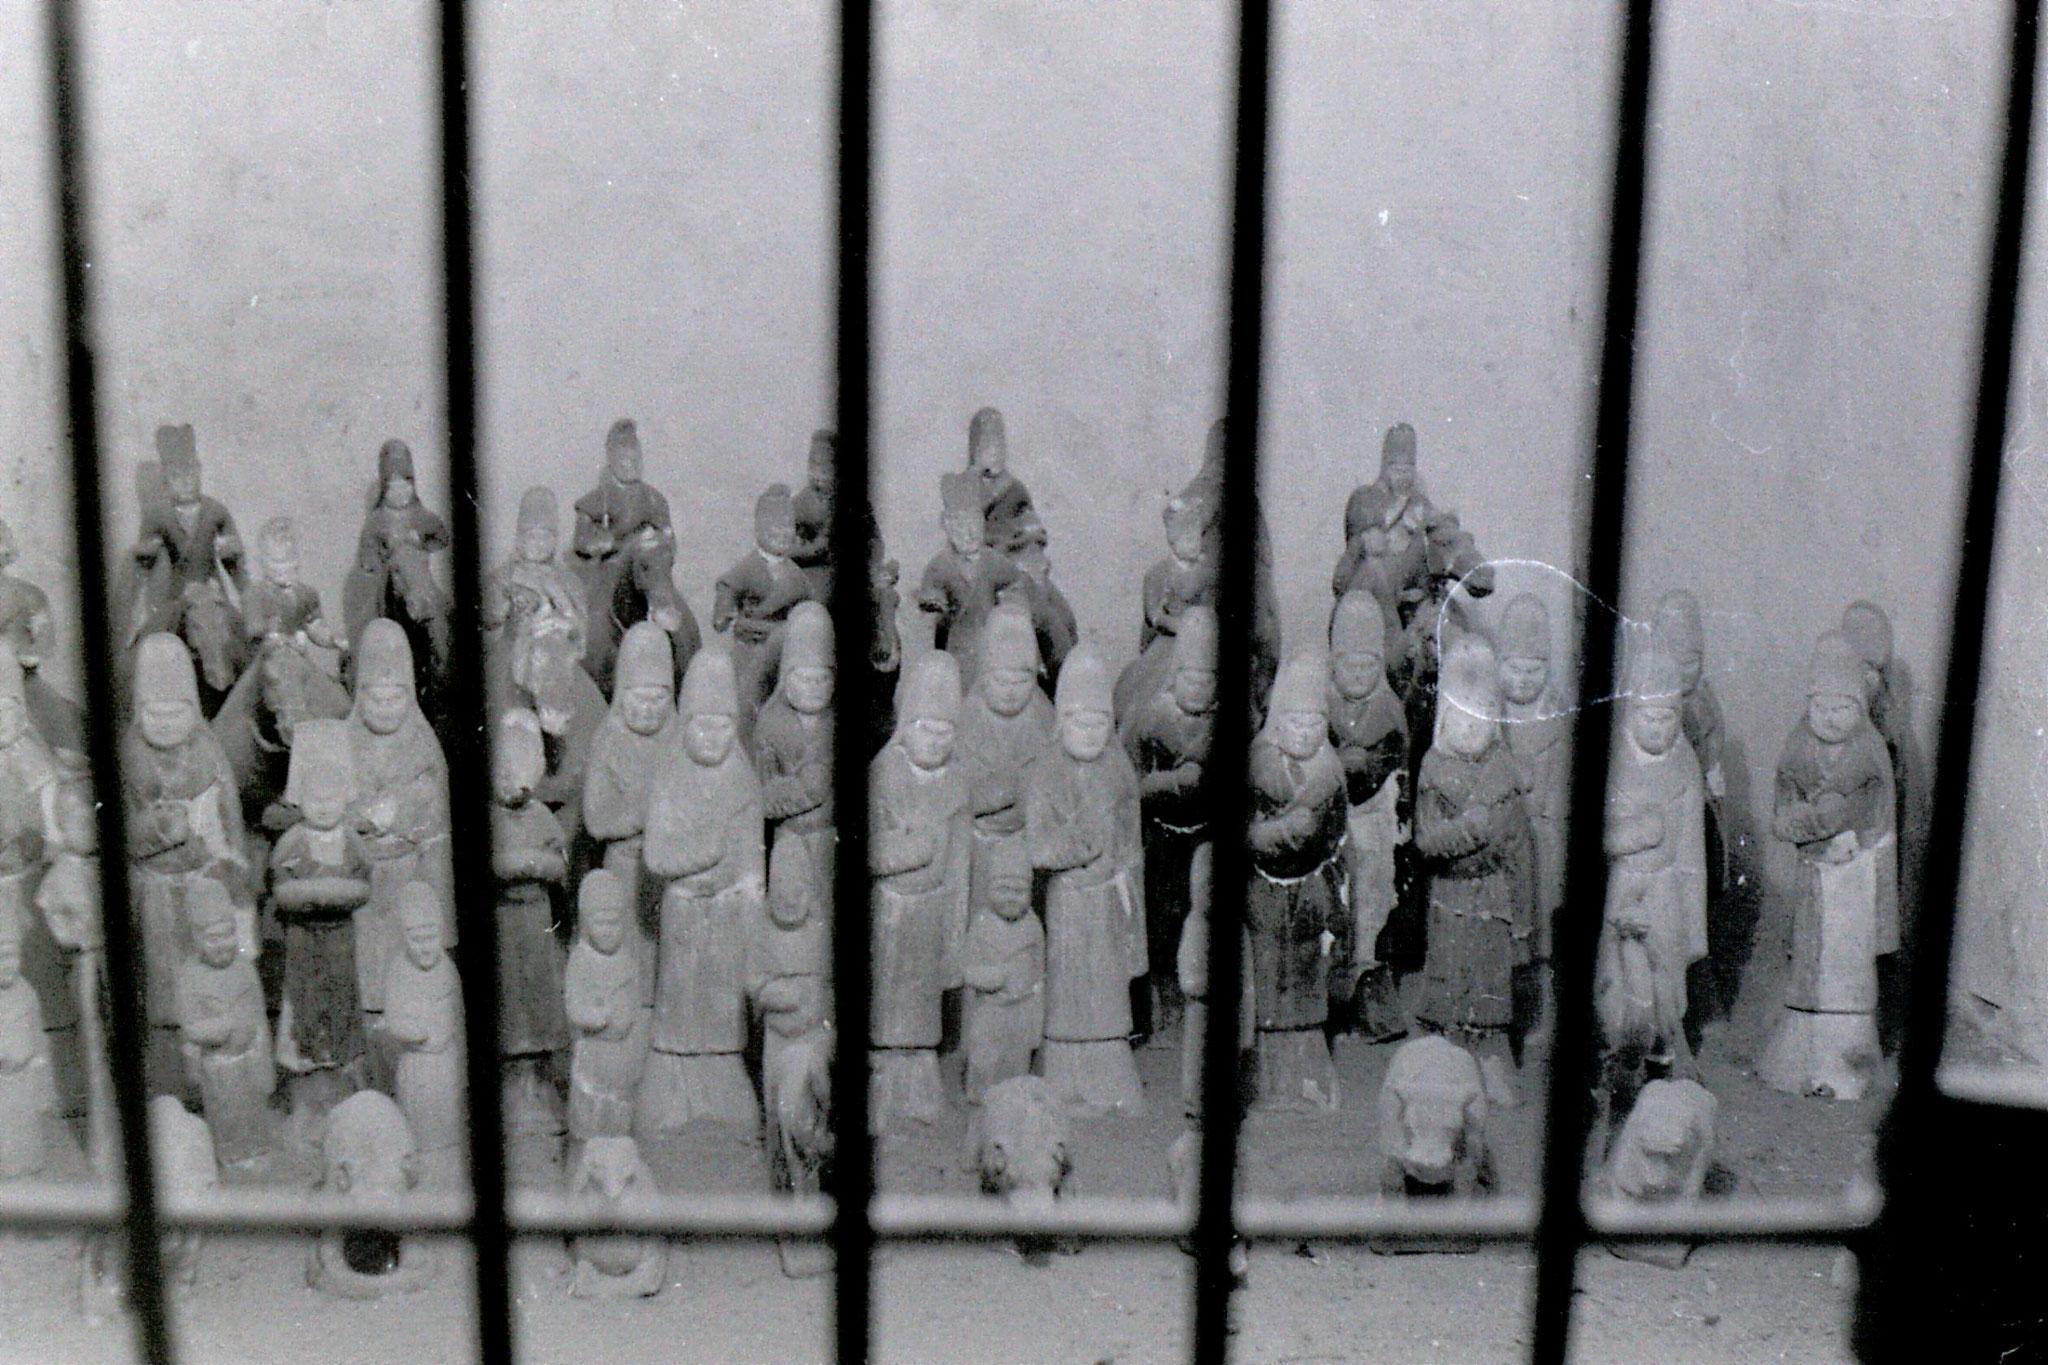 7/3/1989: 24: Xianyang Zhang tomb figures